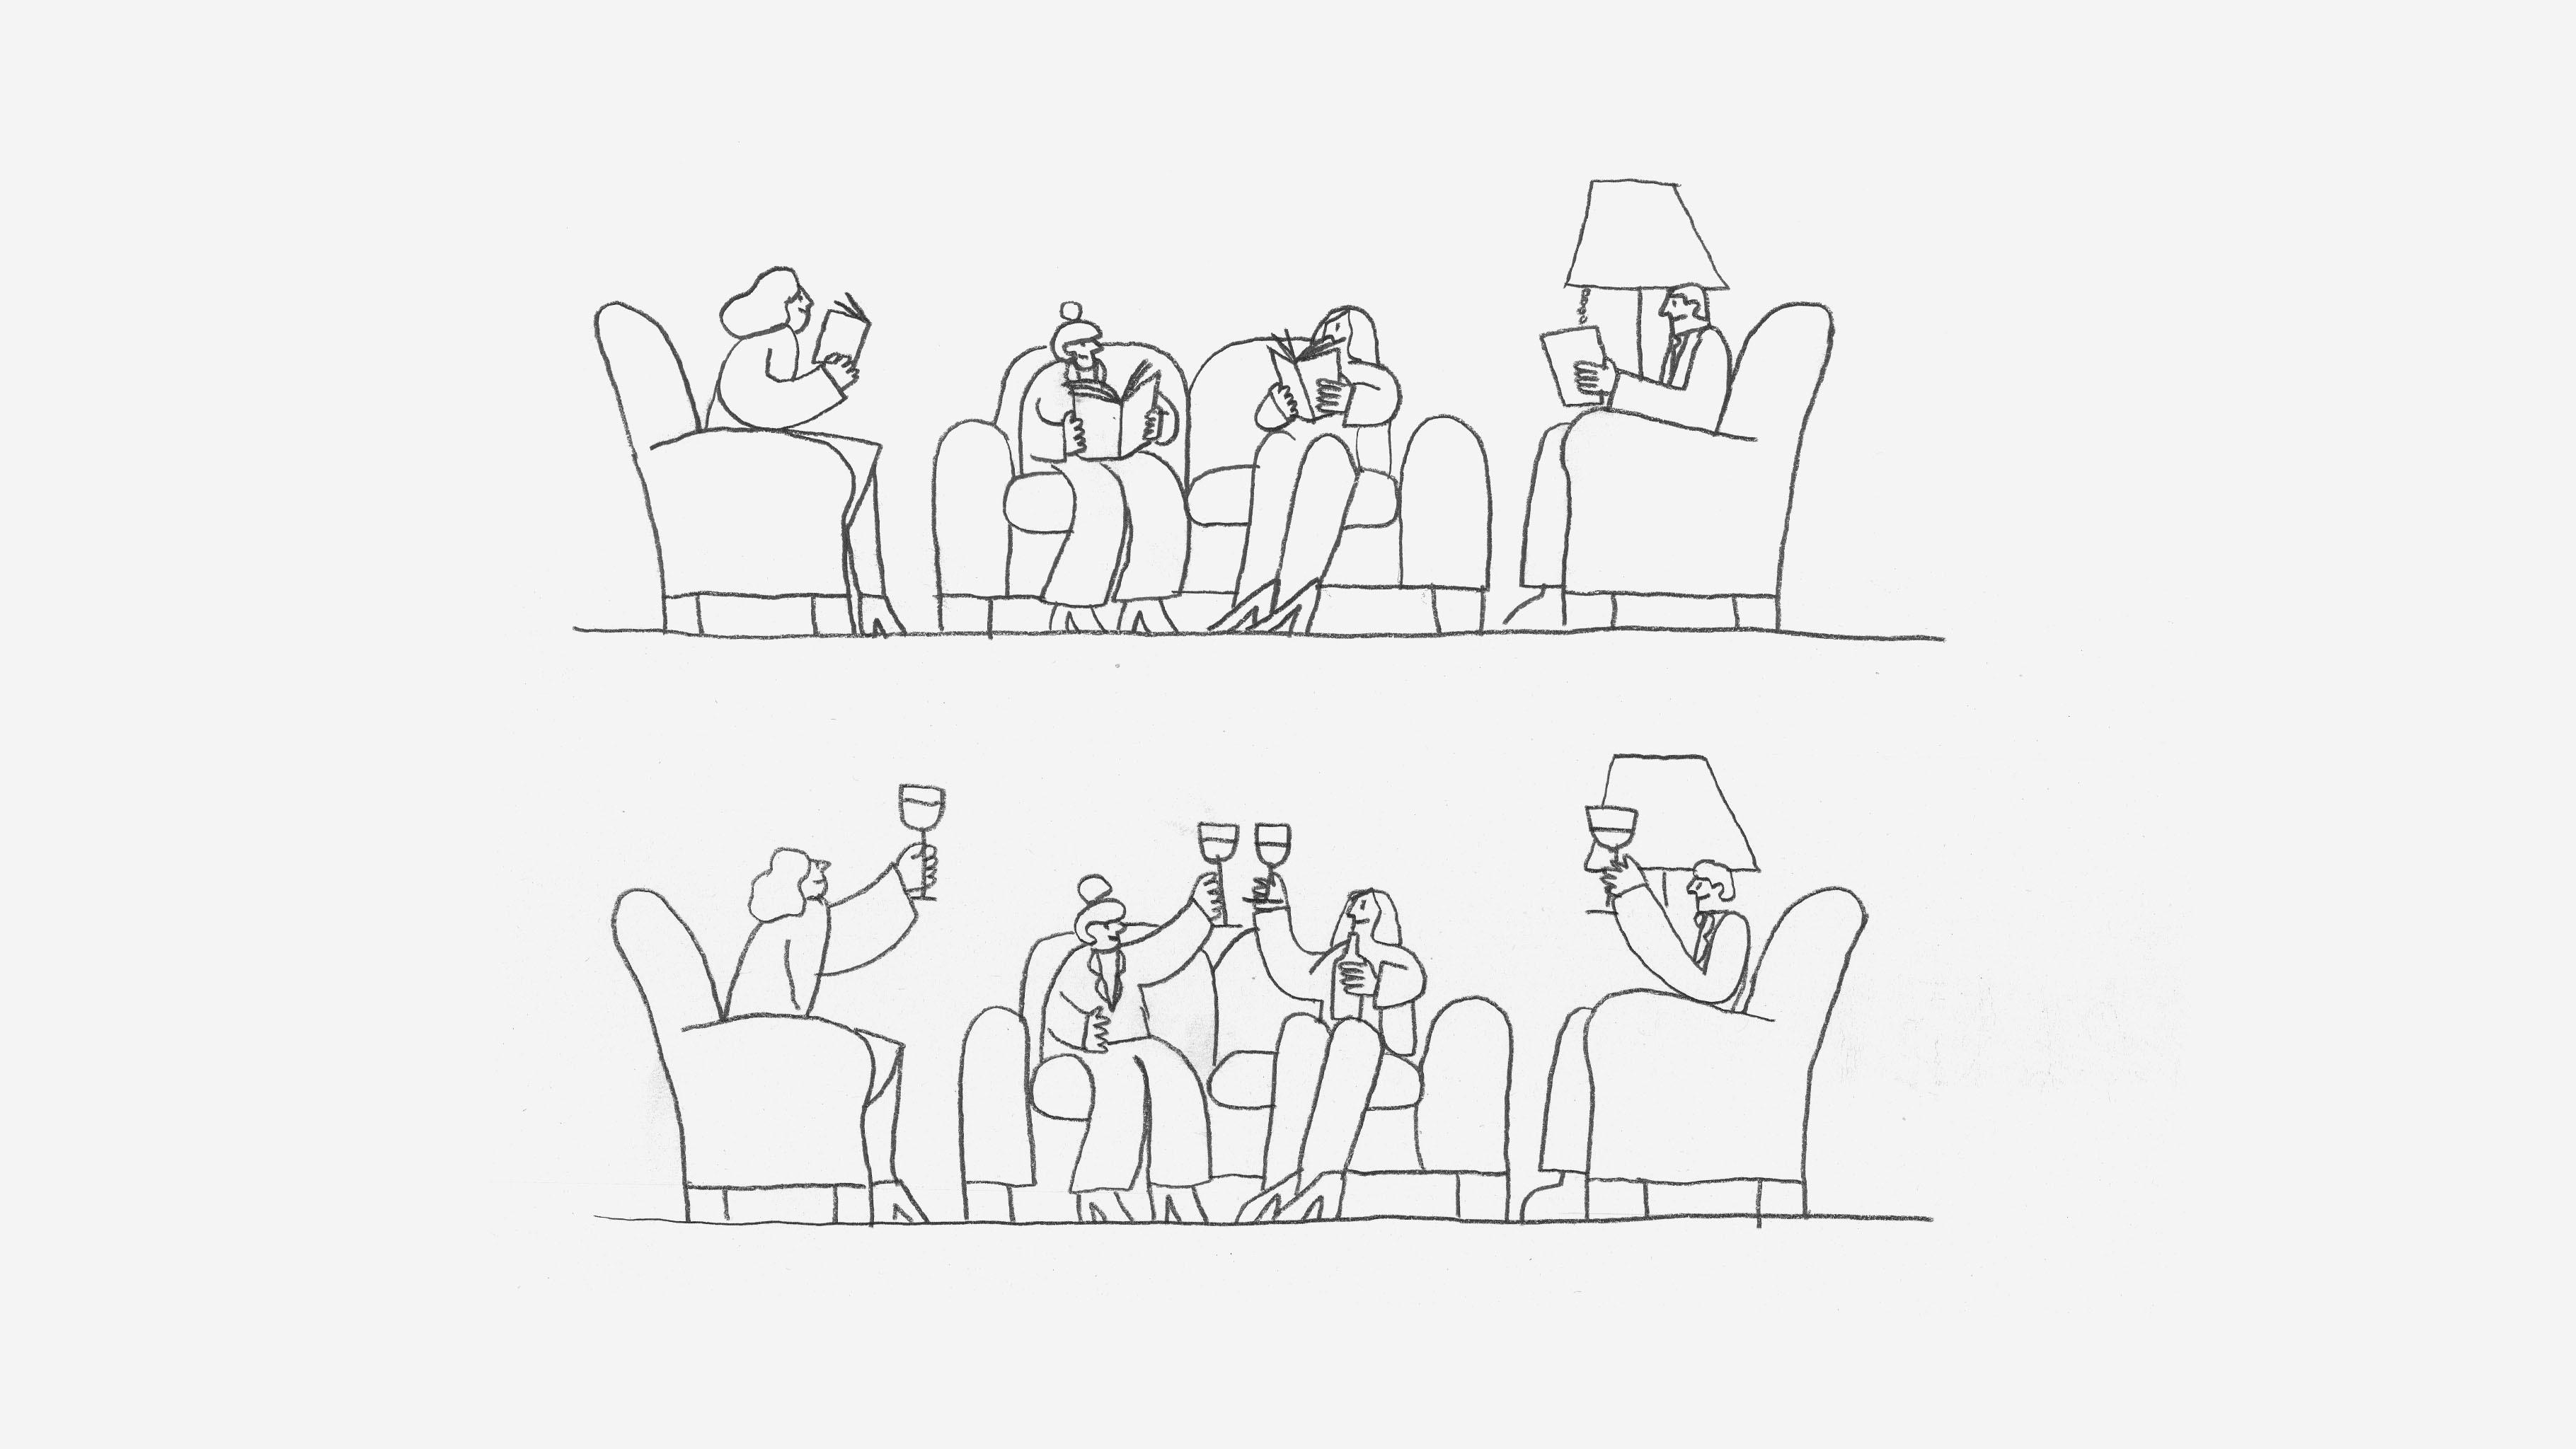 Facebook Groups James Graham Sketches Storyboards 05